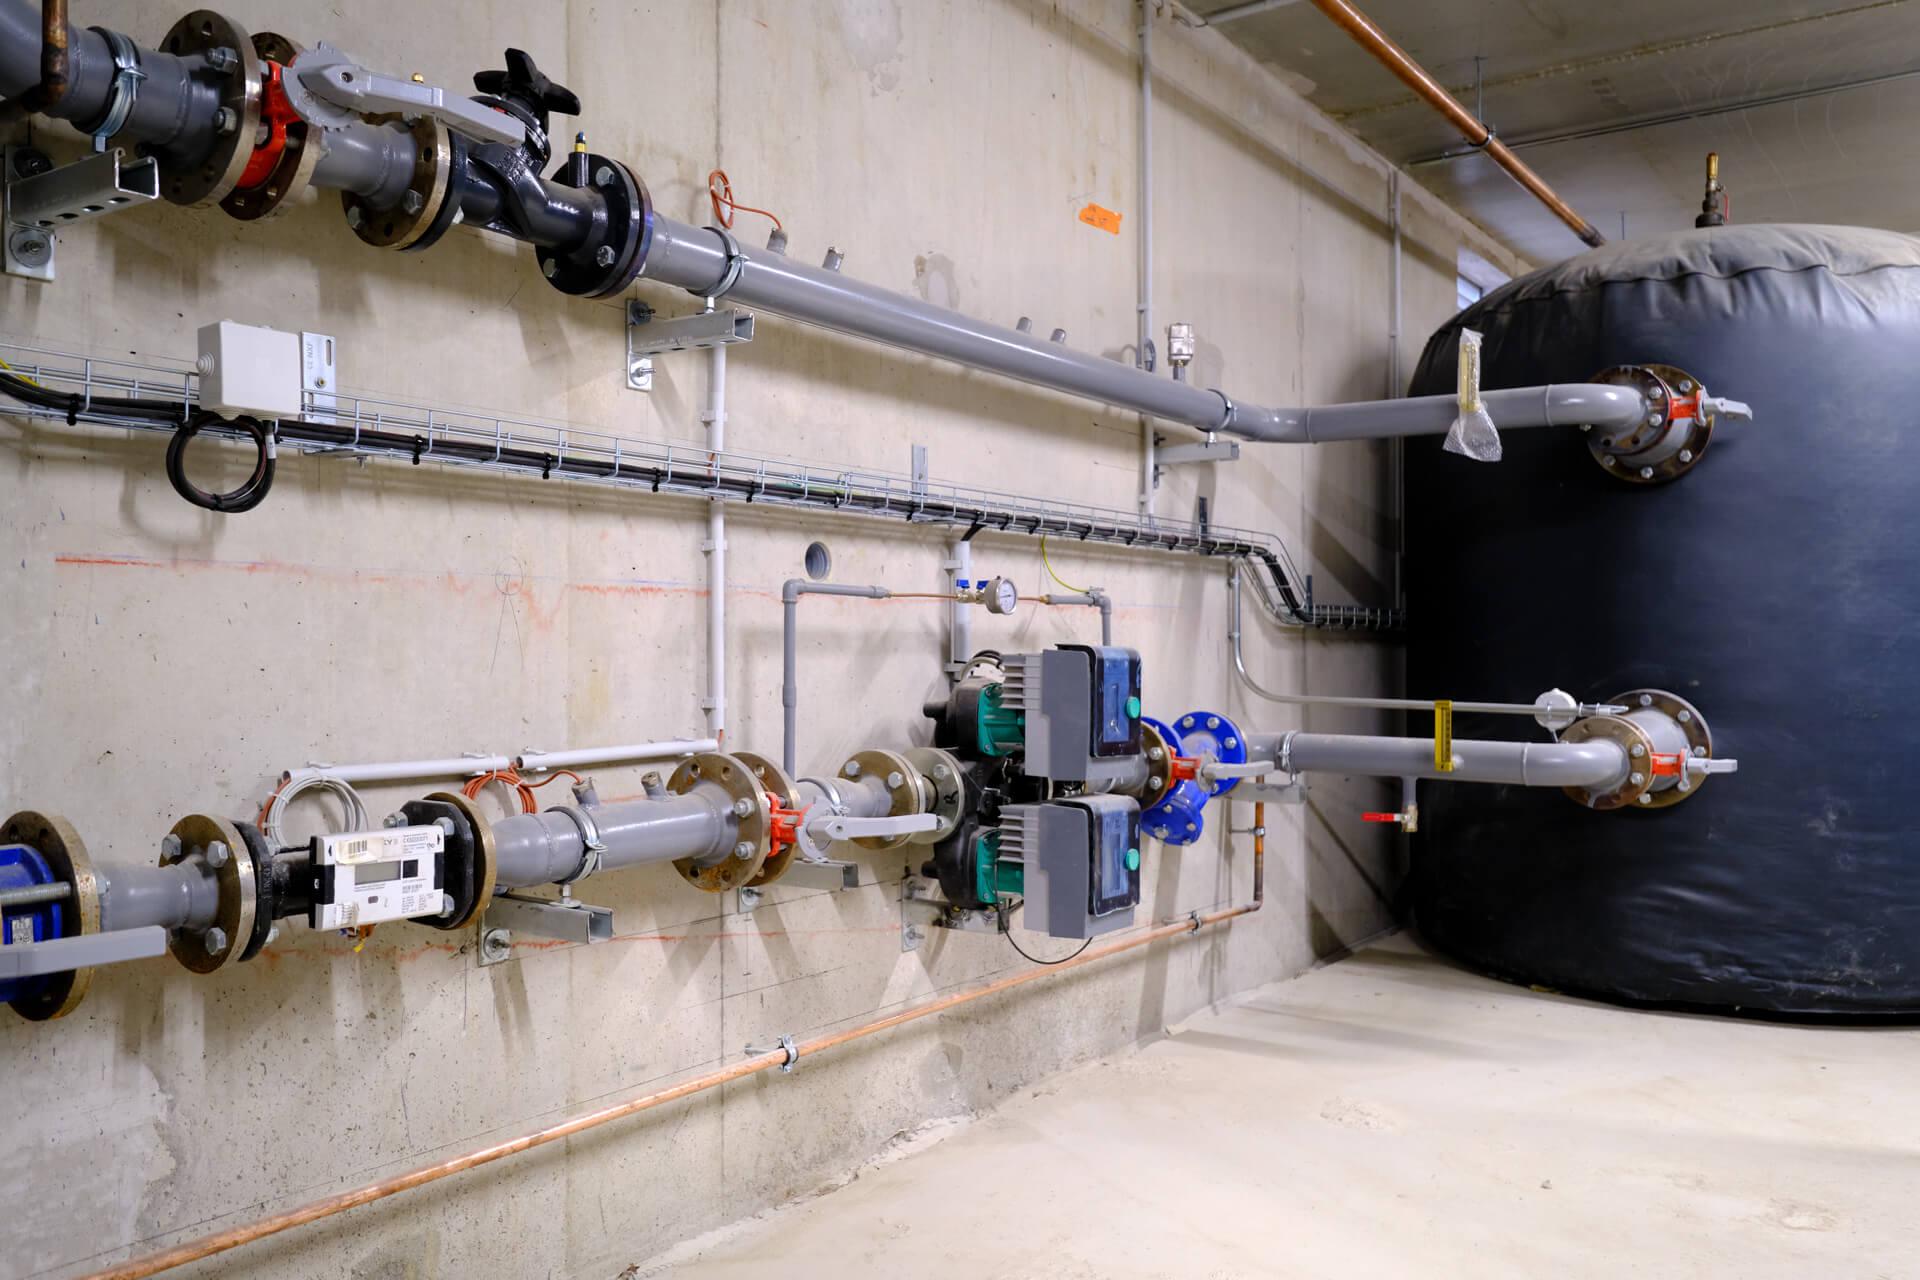 Recrutement: Chef d'équipe plomberie logement collectif neuf F/H chez Emeraude RH à Saint-Malo